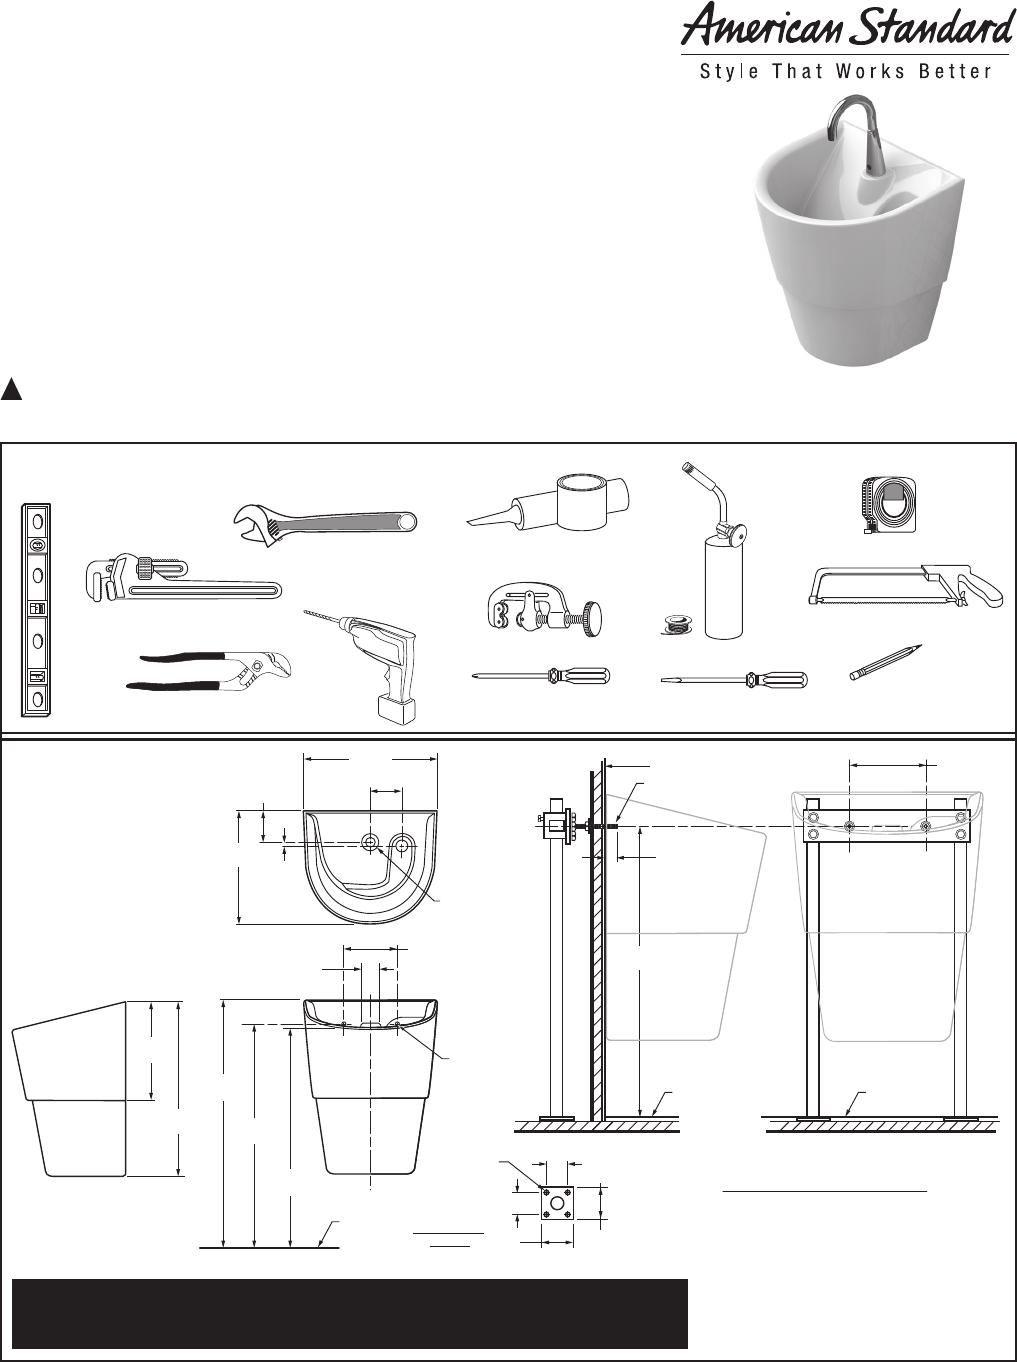 hight resolution of american standard 9118 1 9118 111 9118 15 icu sink system installation instructions